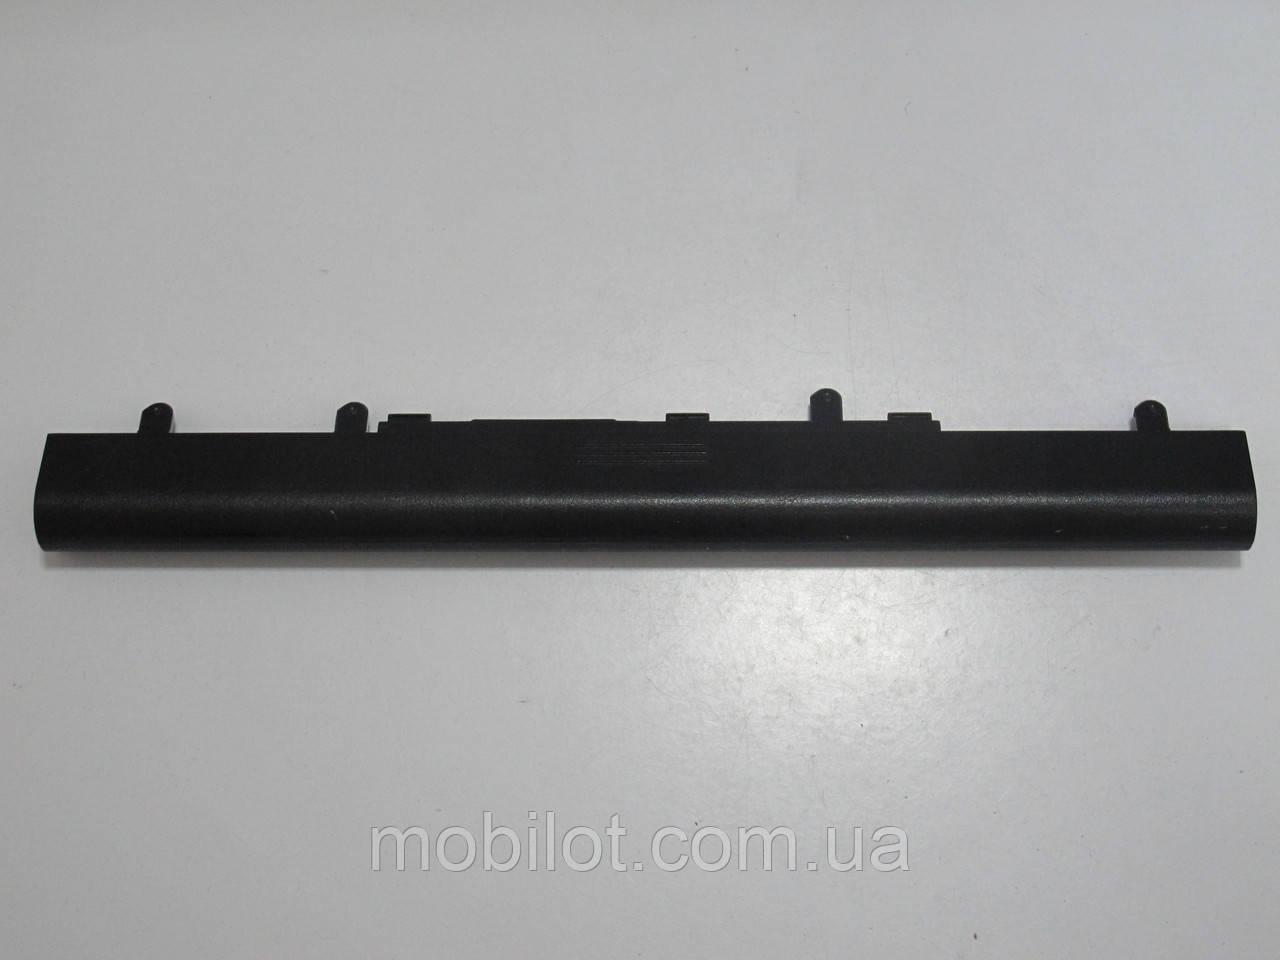 Аккумуляторная батарея Acer V5-531 (NZ-4966)